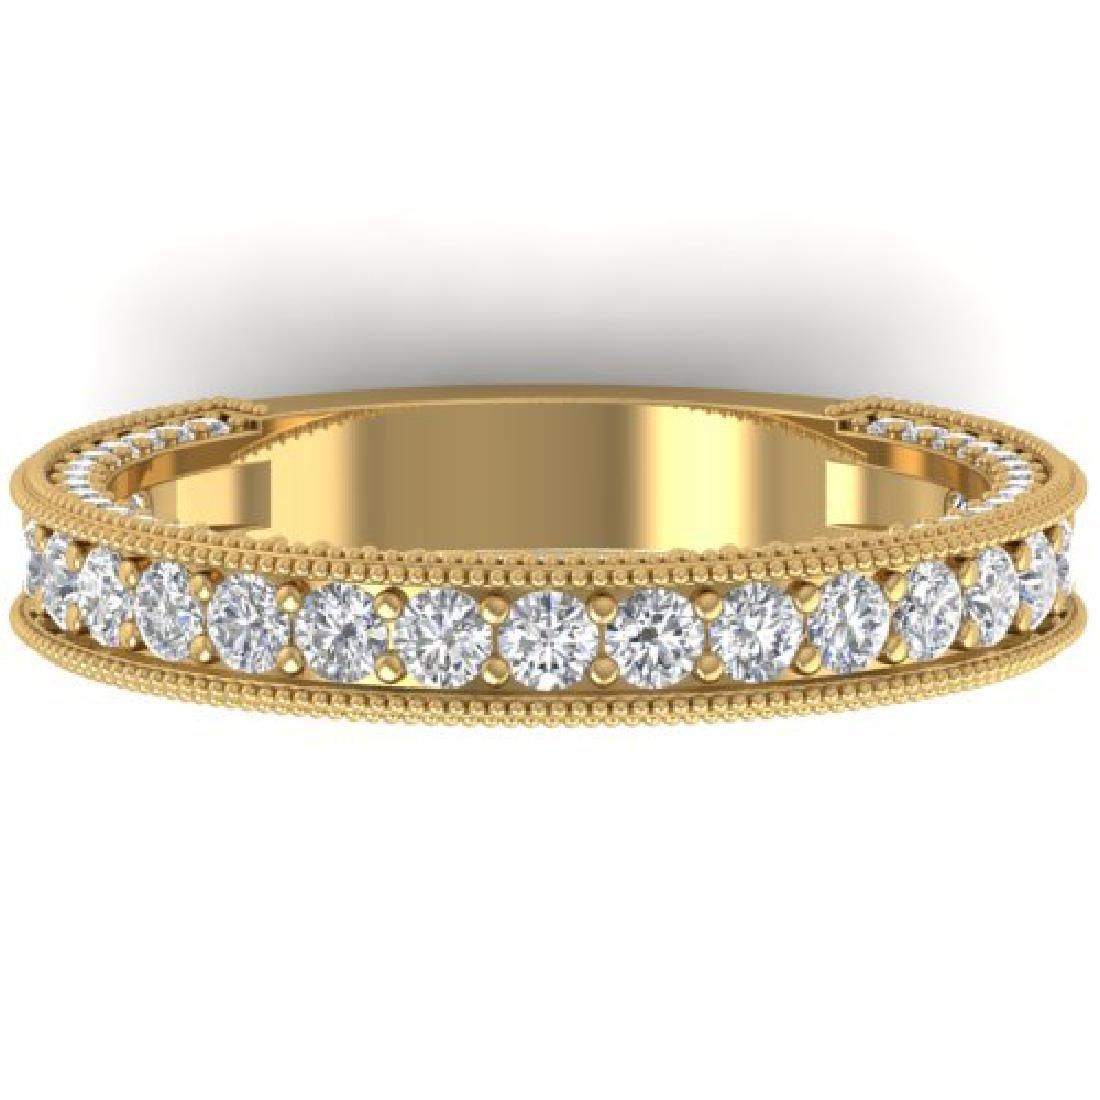 1.25 CTW VS/SI Diamond Art Deco Eternity Band Ring 14K